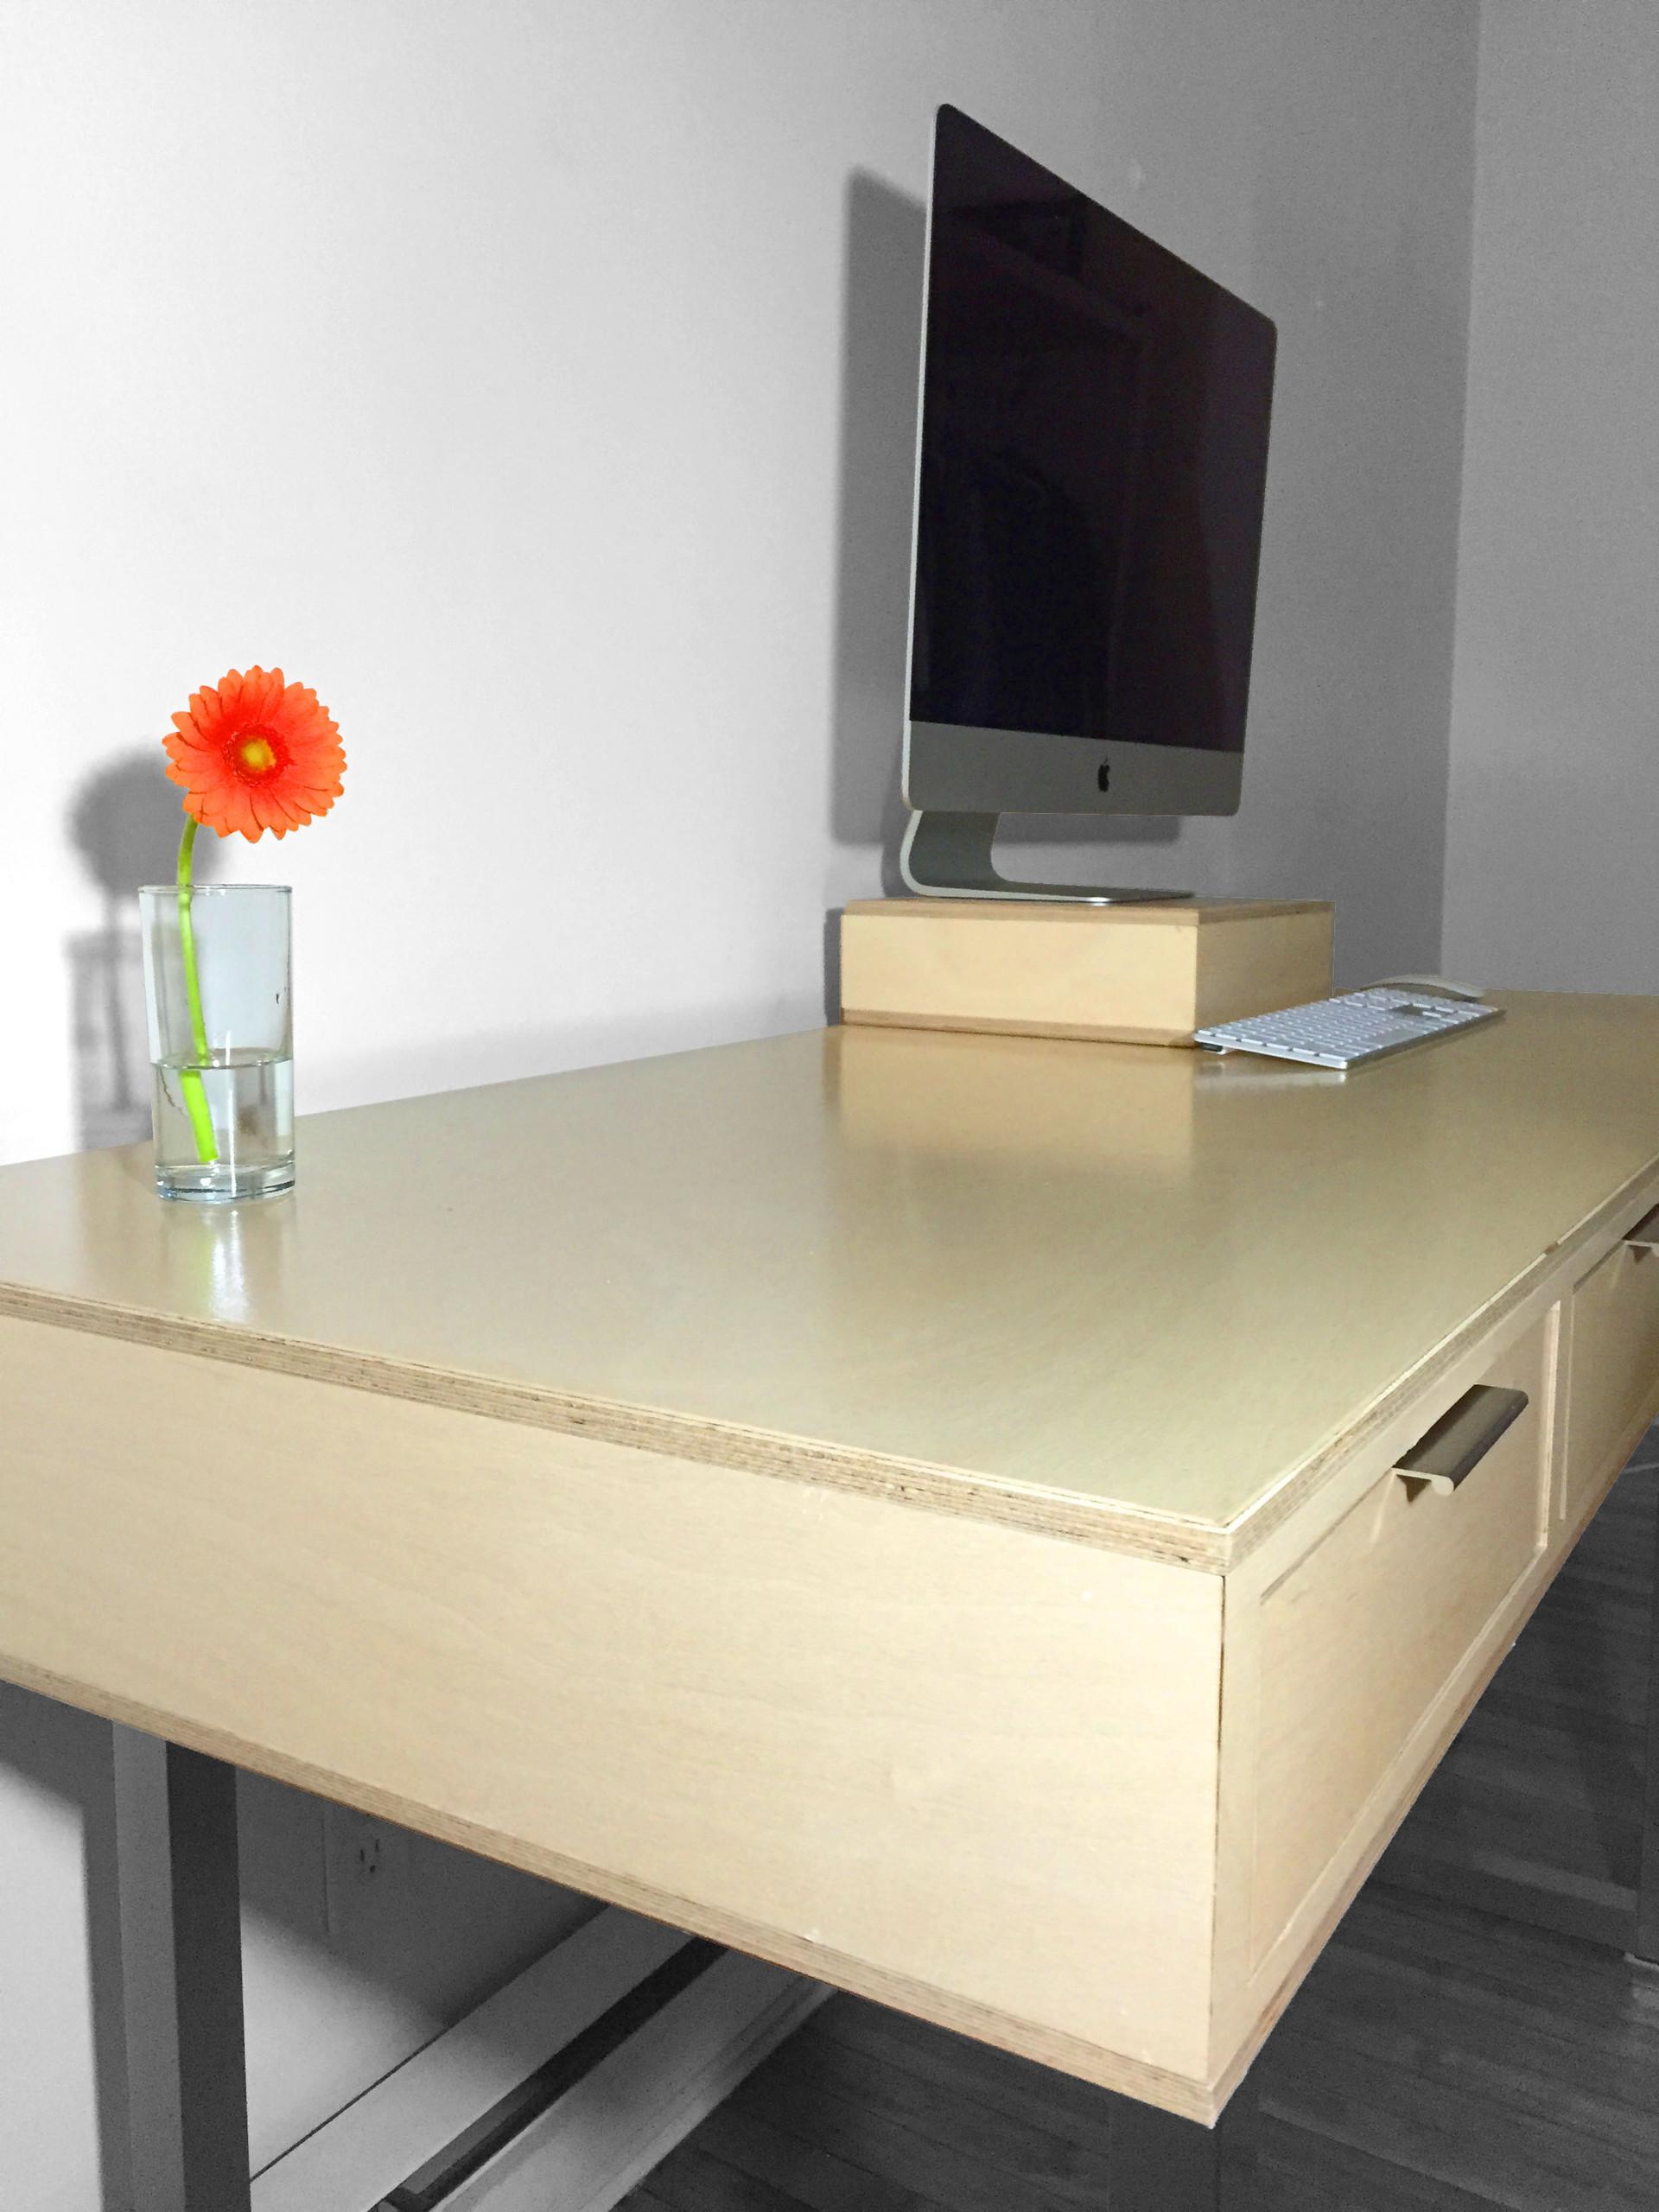 Desk_02 edit.jpg